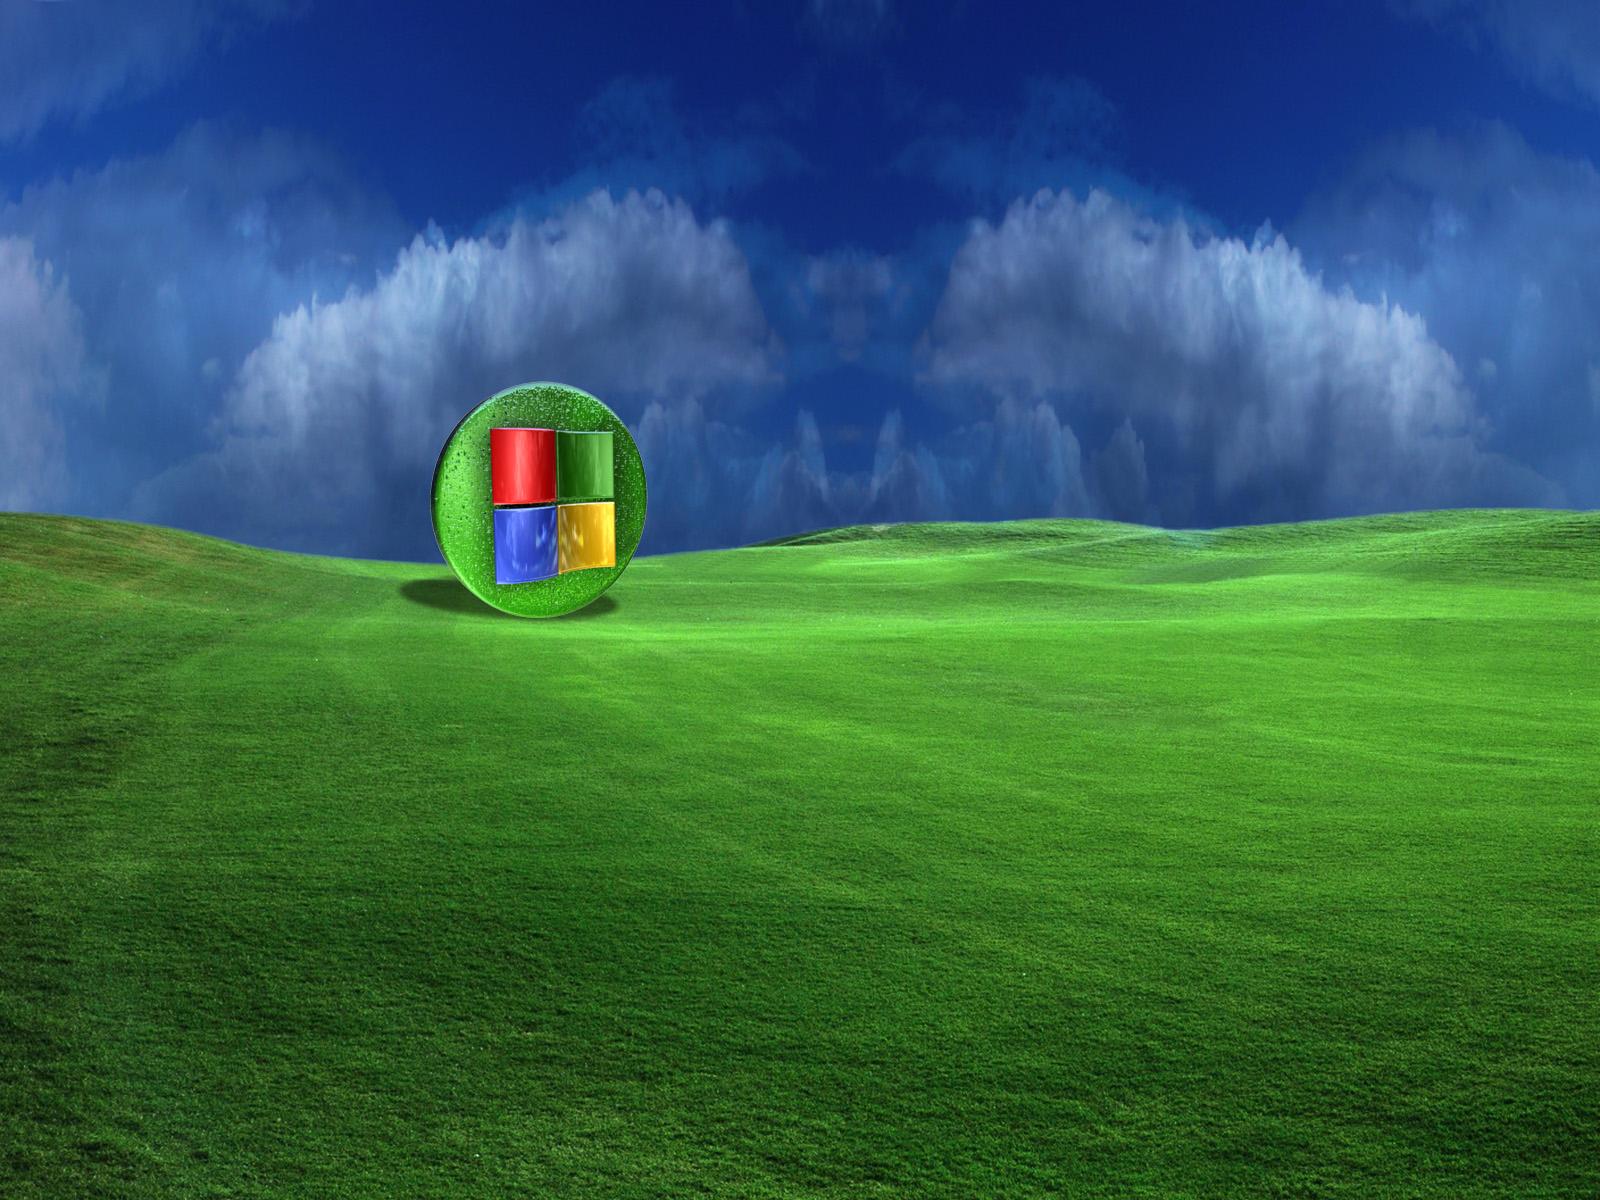 Windows Xp HD Wallpapers - HD Wallpapers